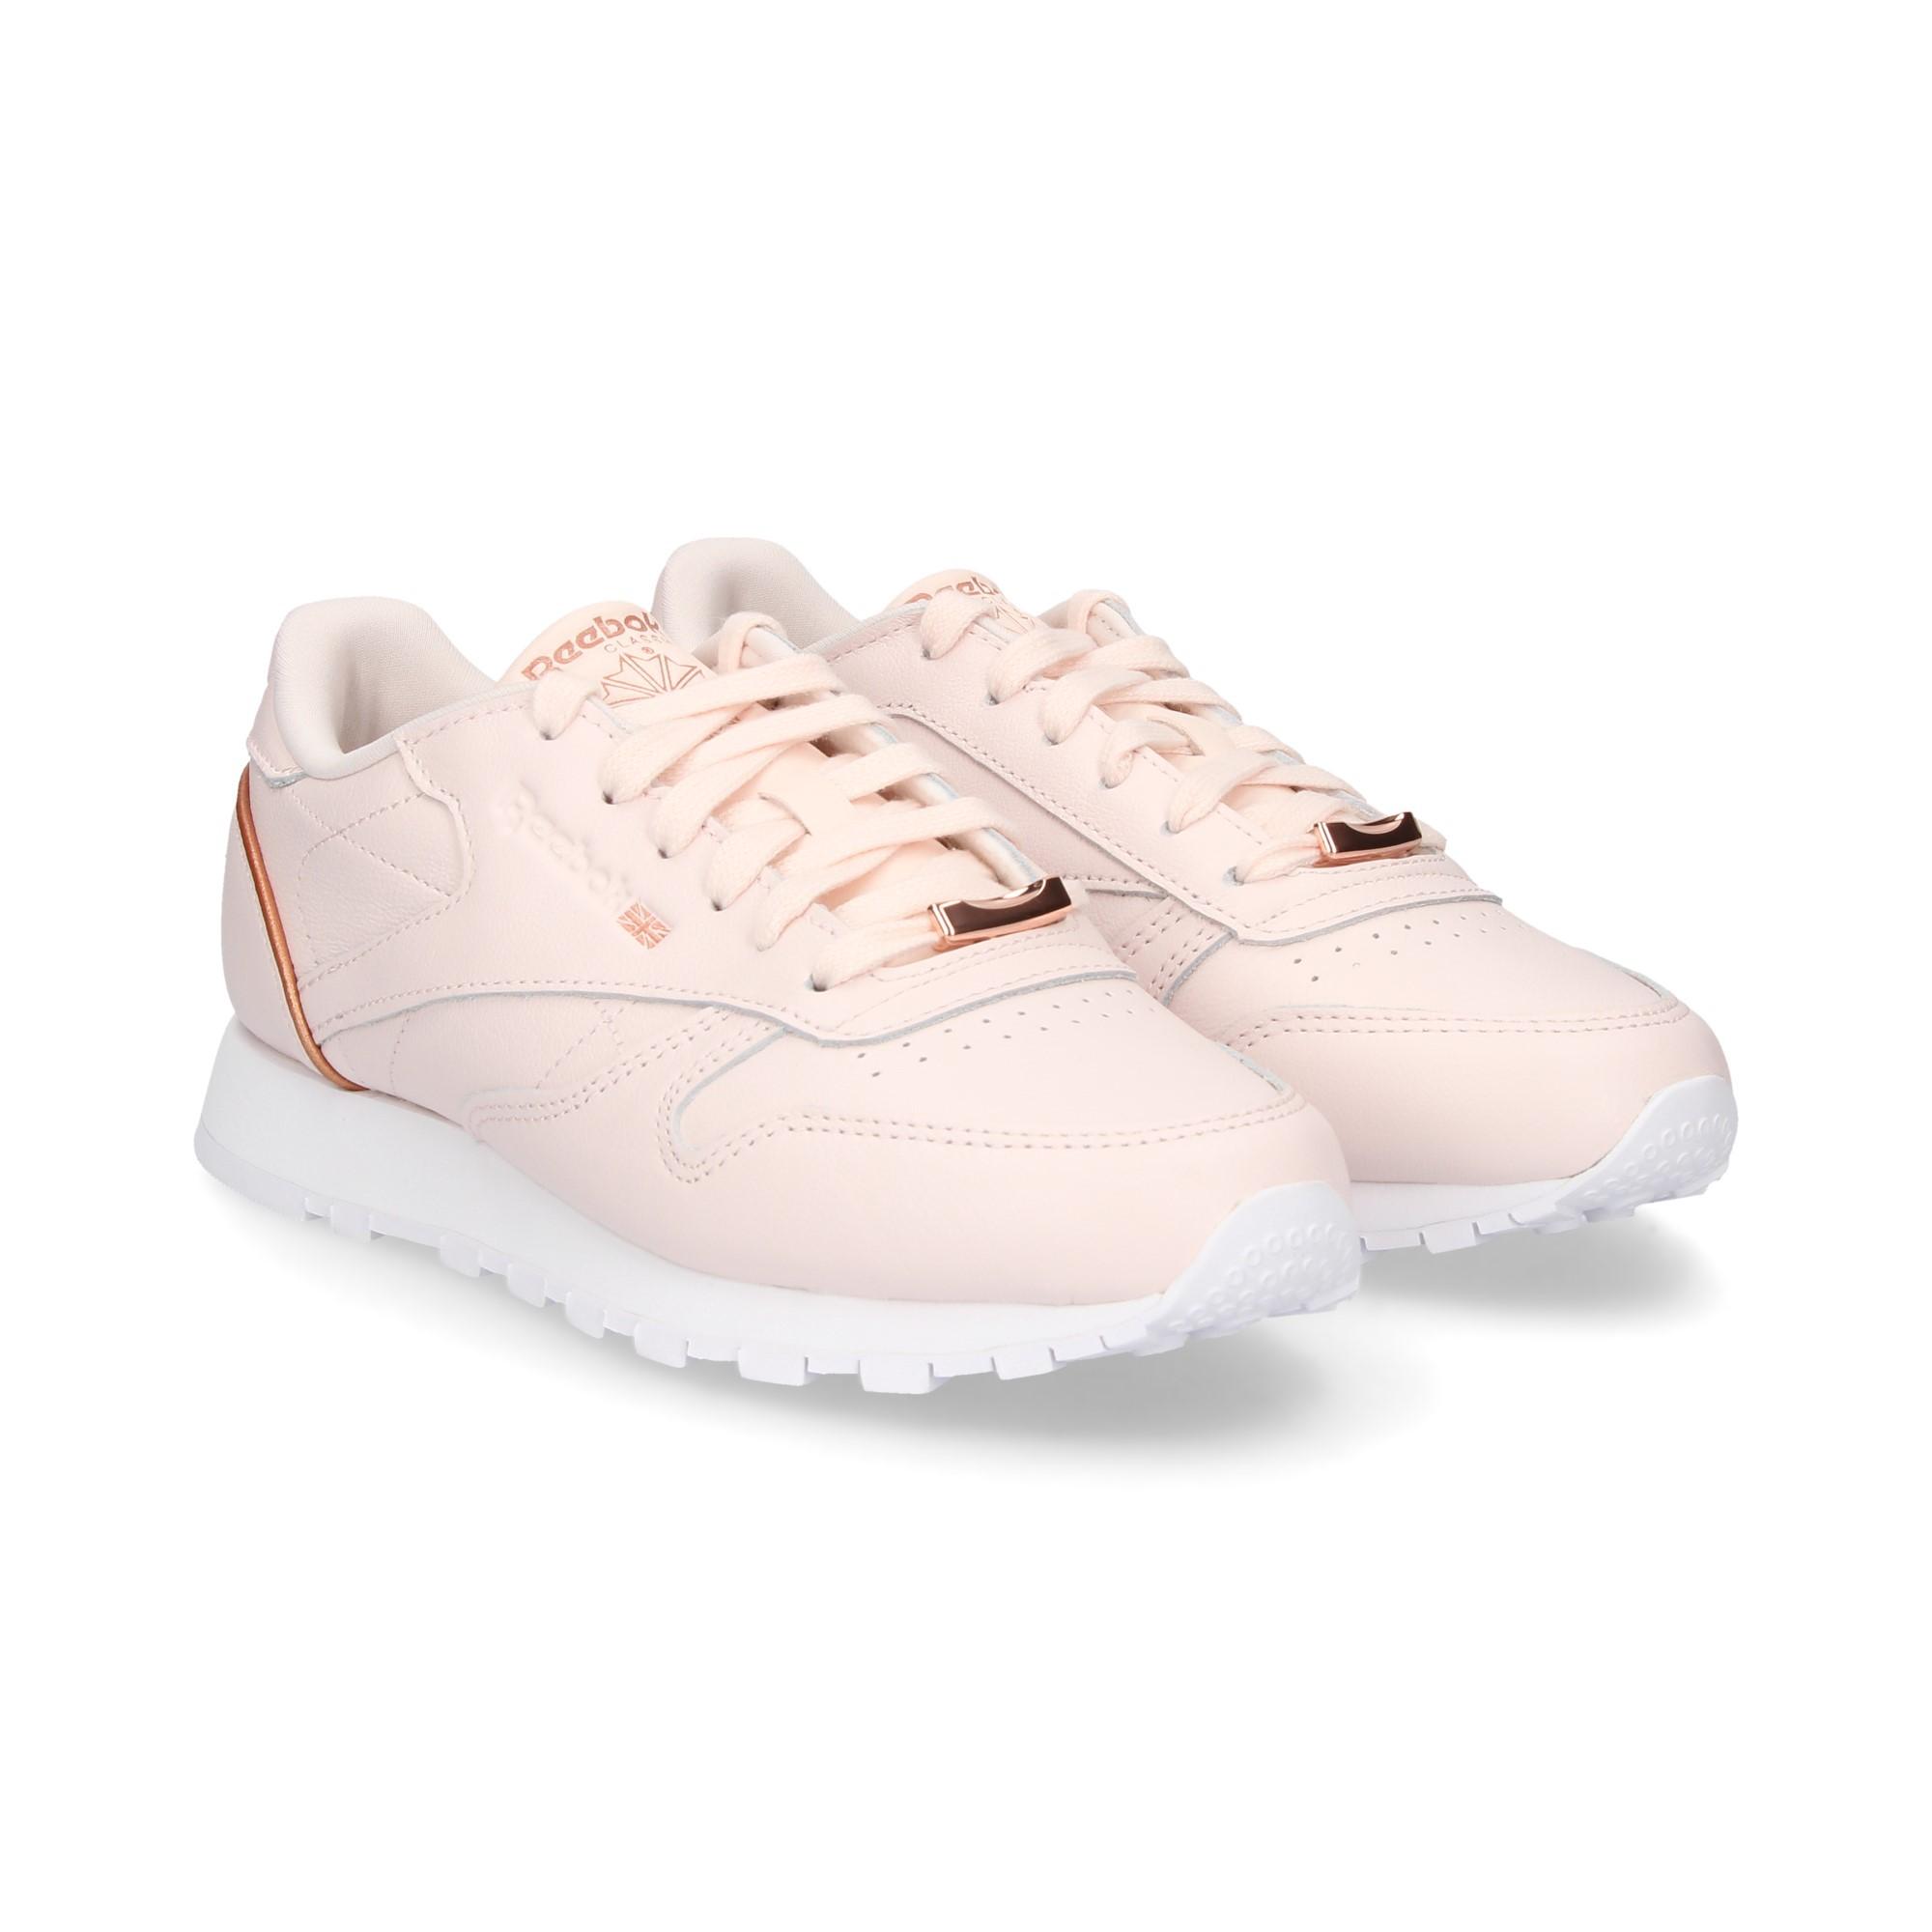 2c92baf2b26 REEBOK Women s Sneakers BS9880 ROSA